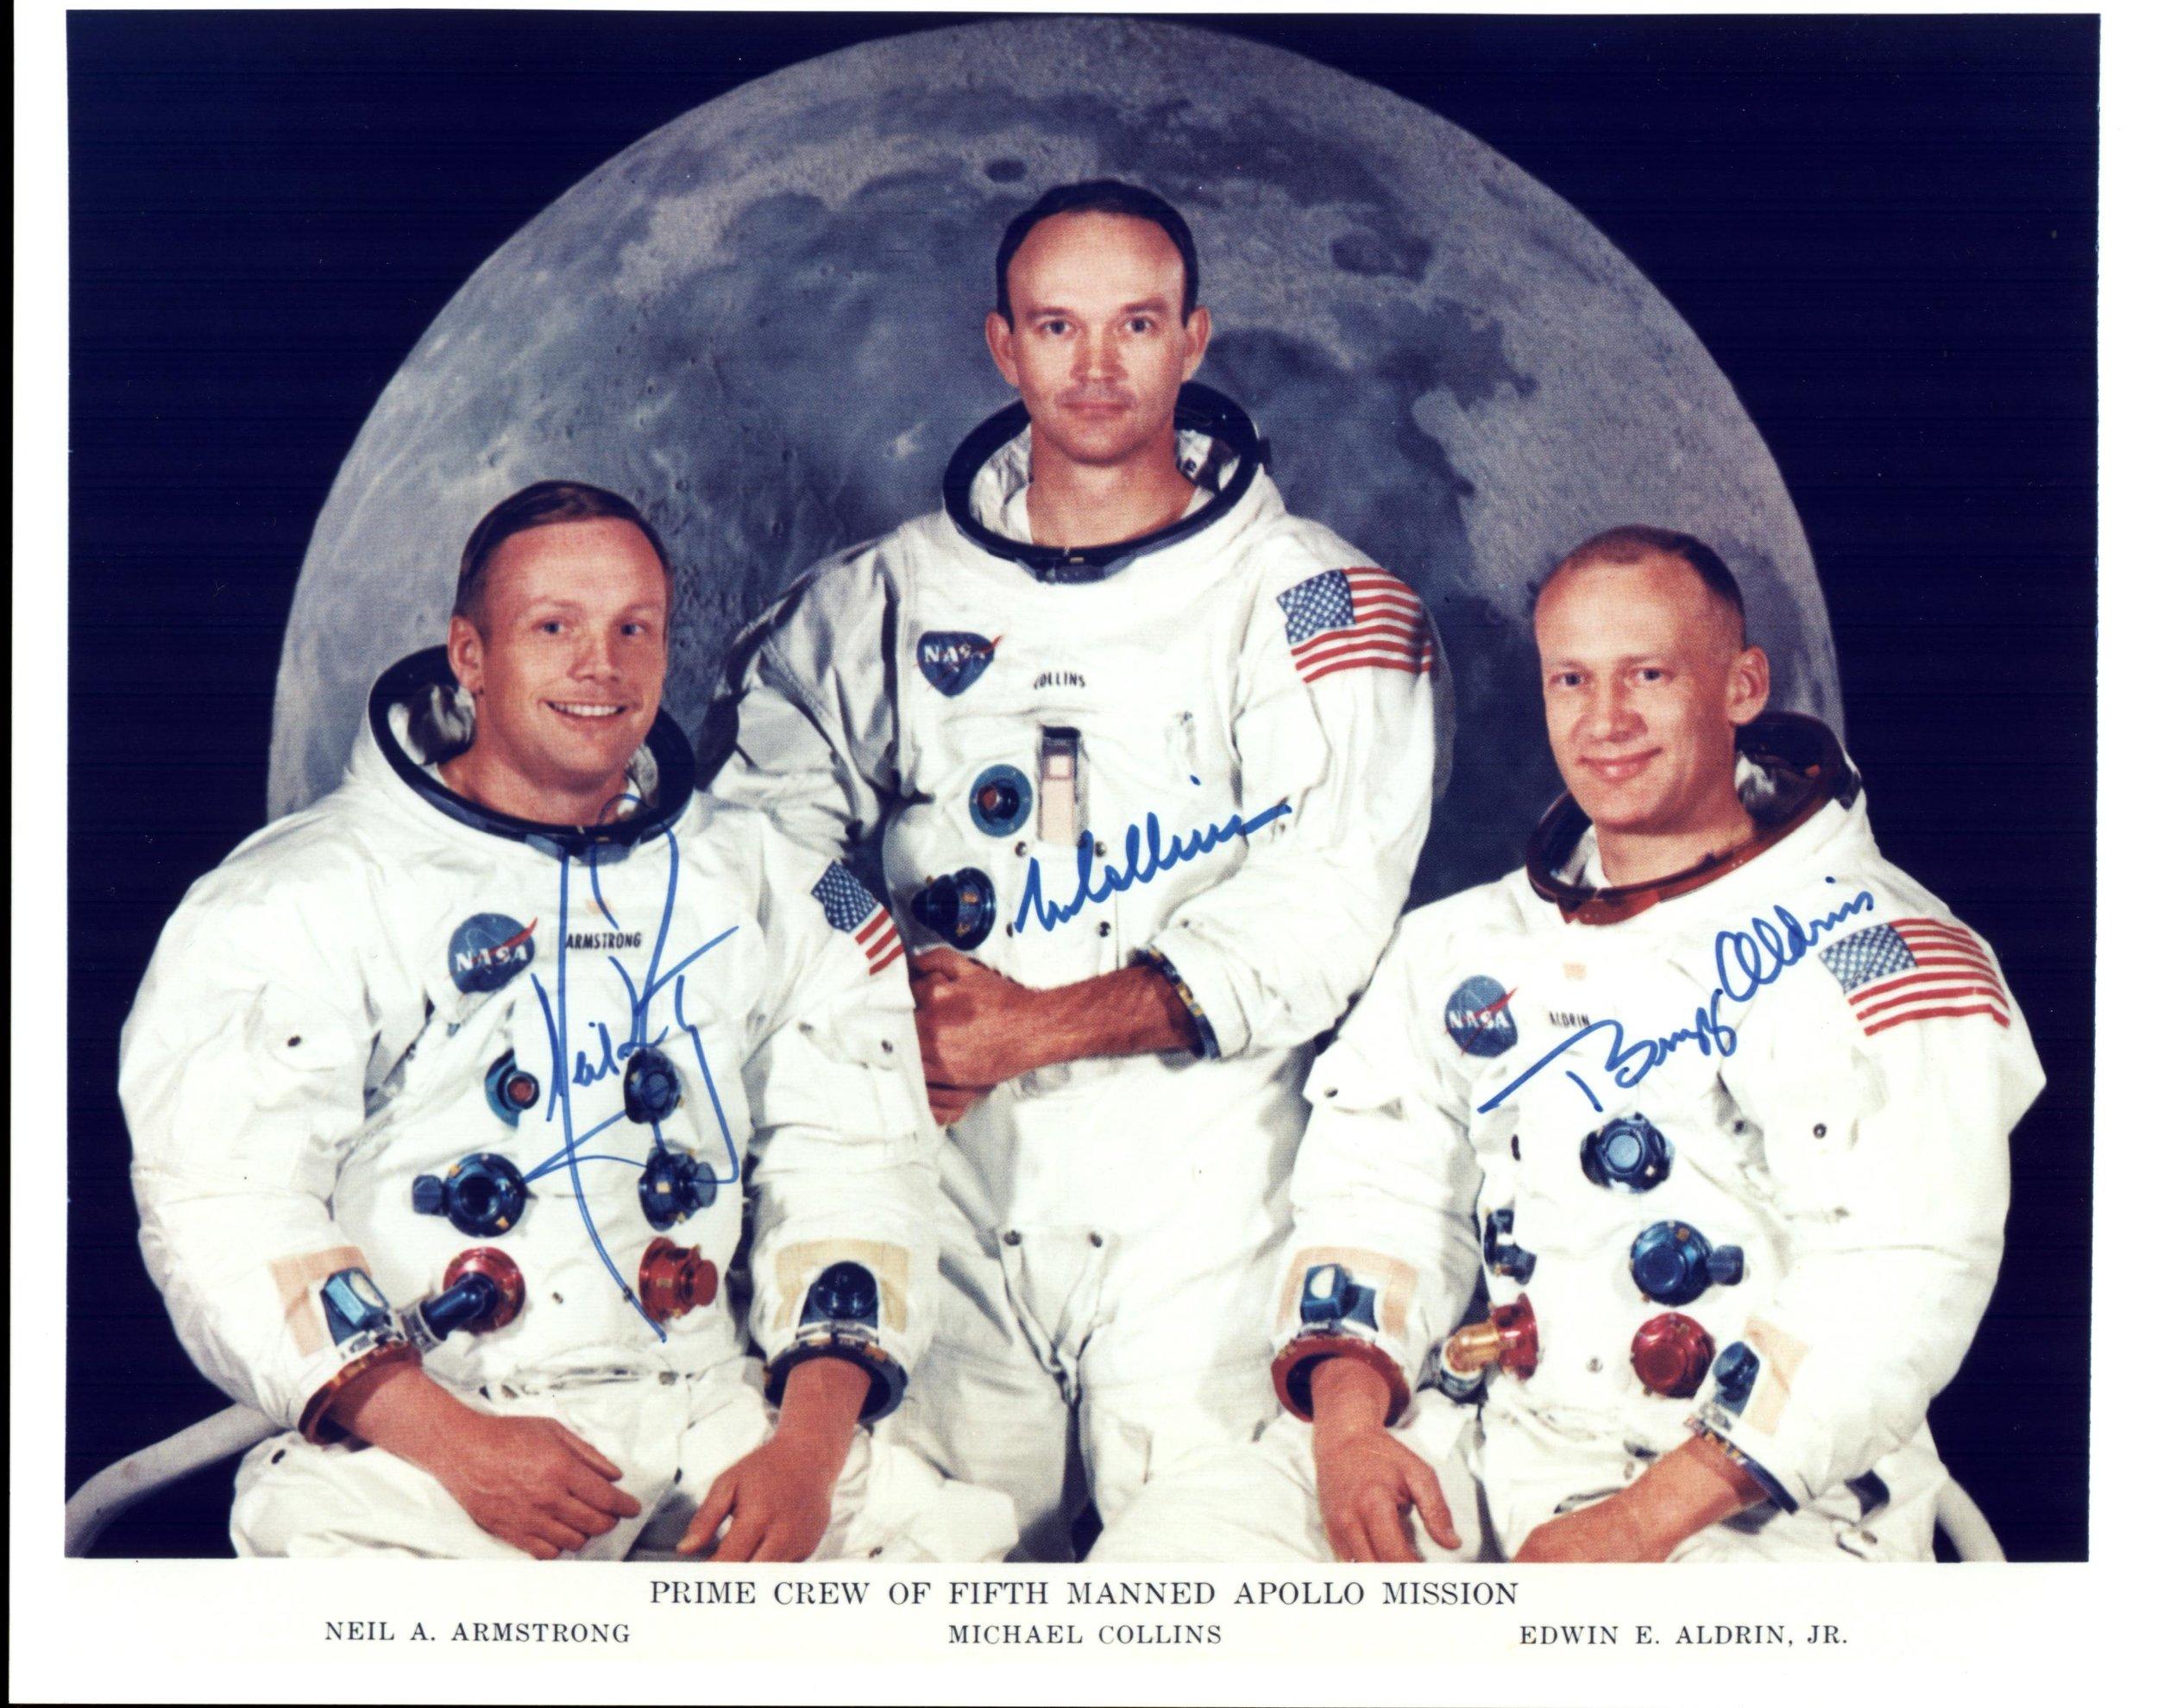 apollo 11 astronauts.jpg